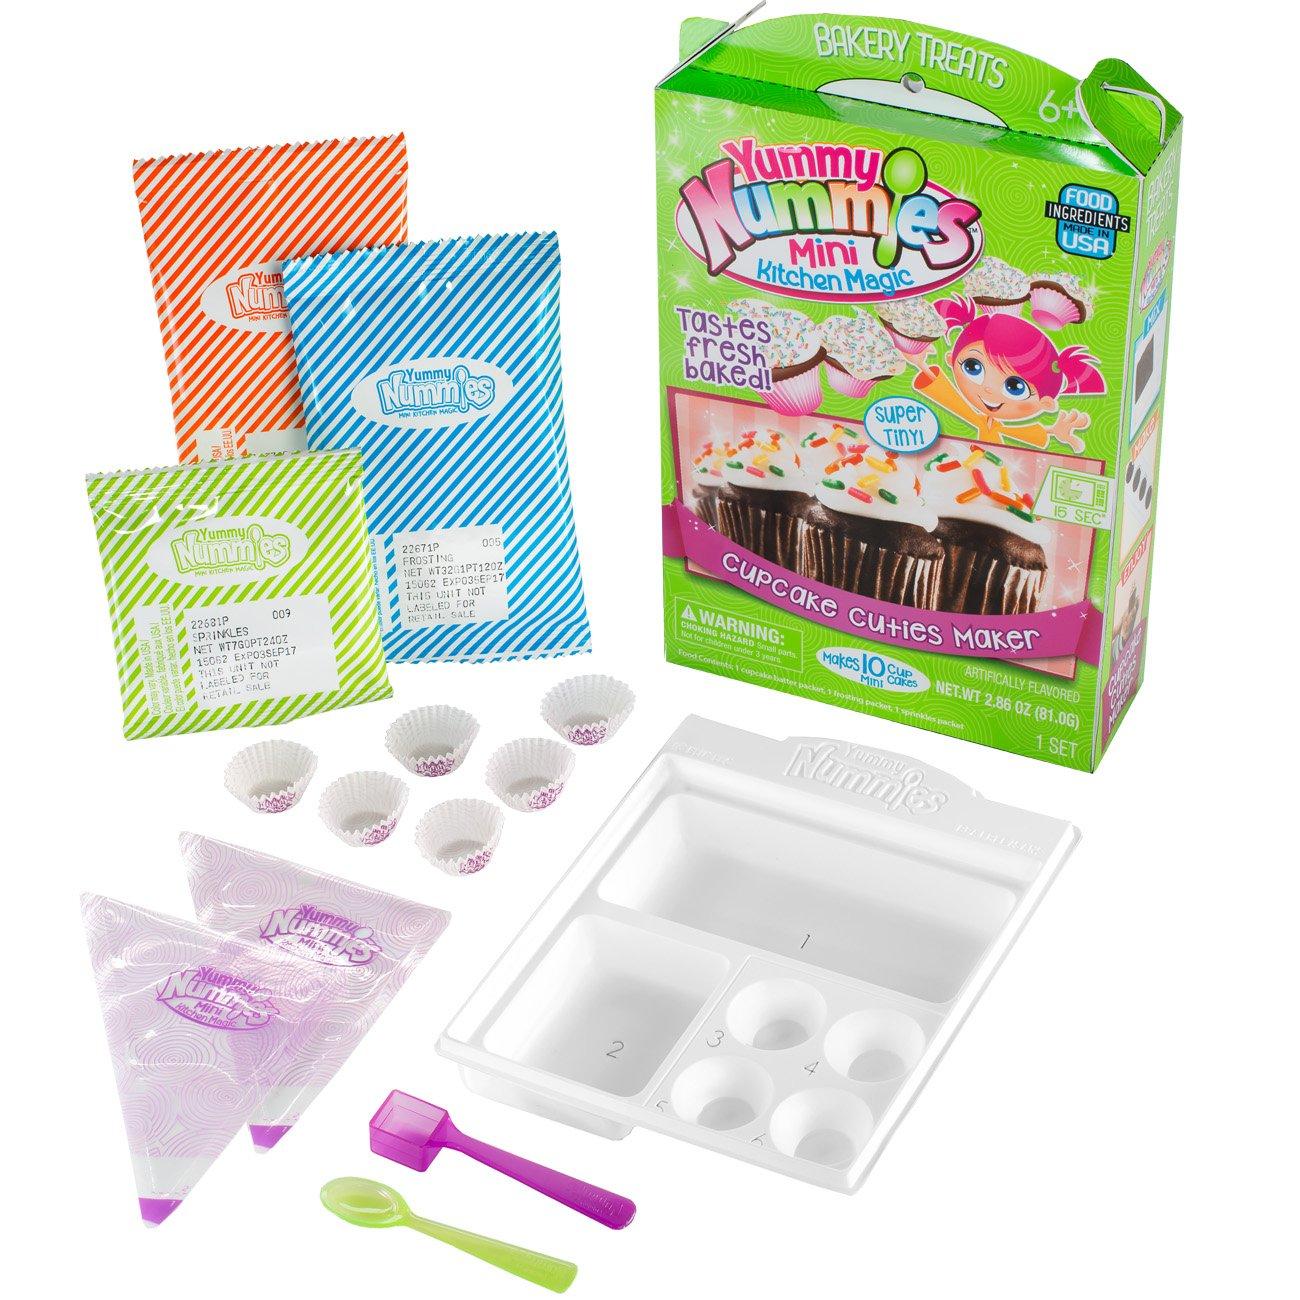 Yummy Nummies Bakery Treats - Cupcake Cuties Maker